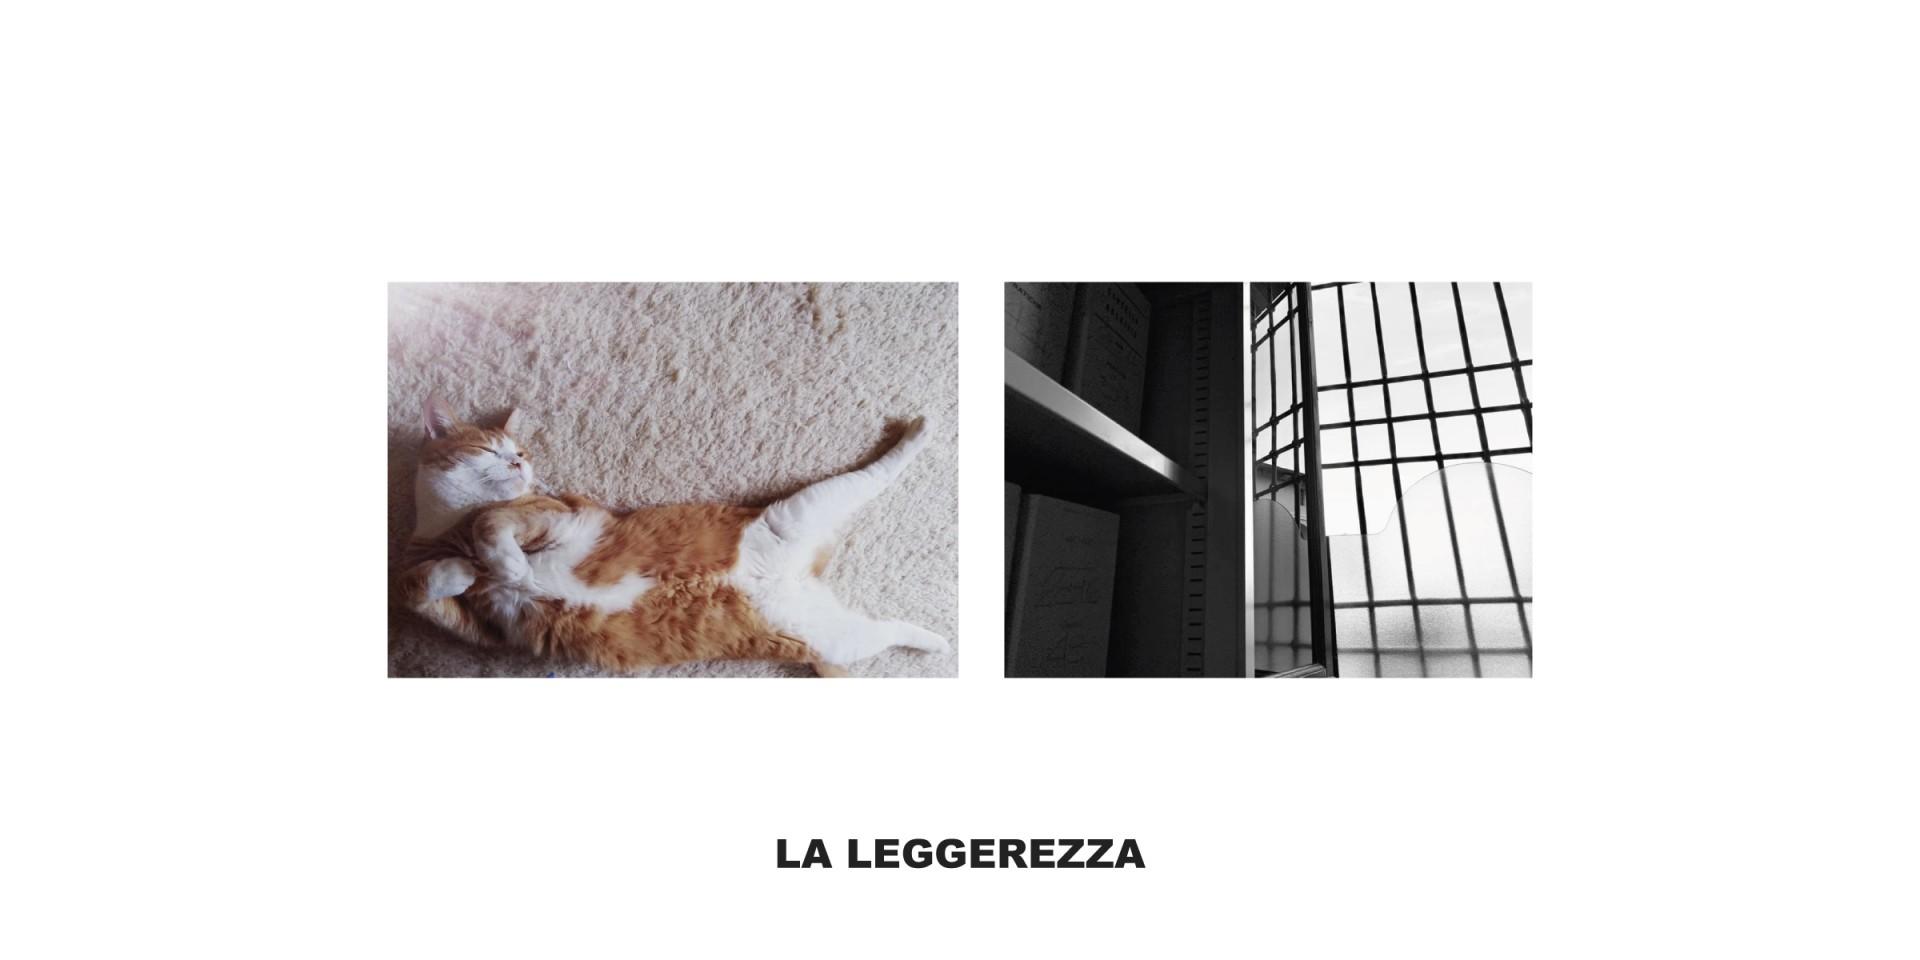 04-slide-la-leggerezza-8.jpg